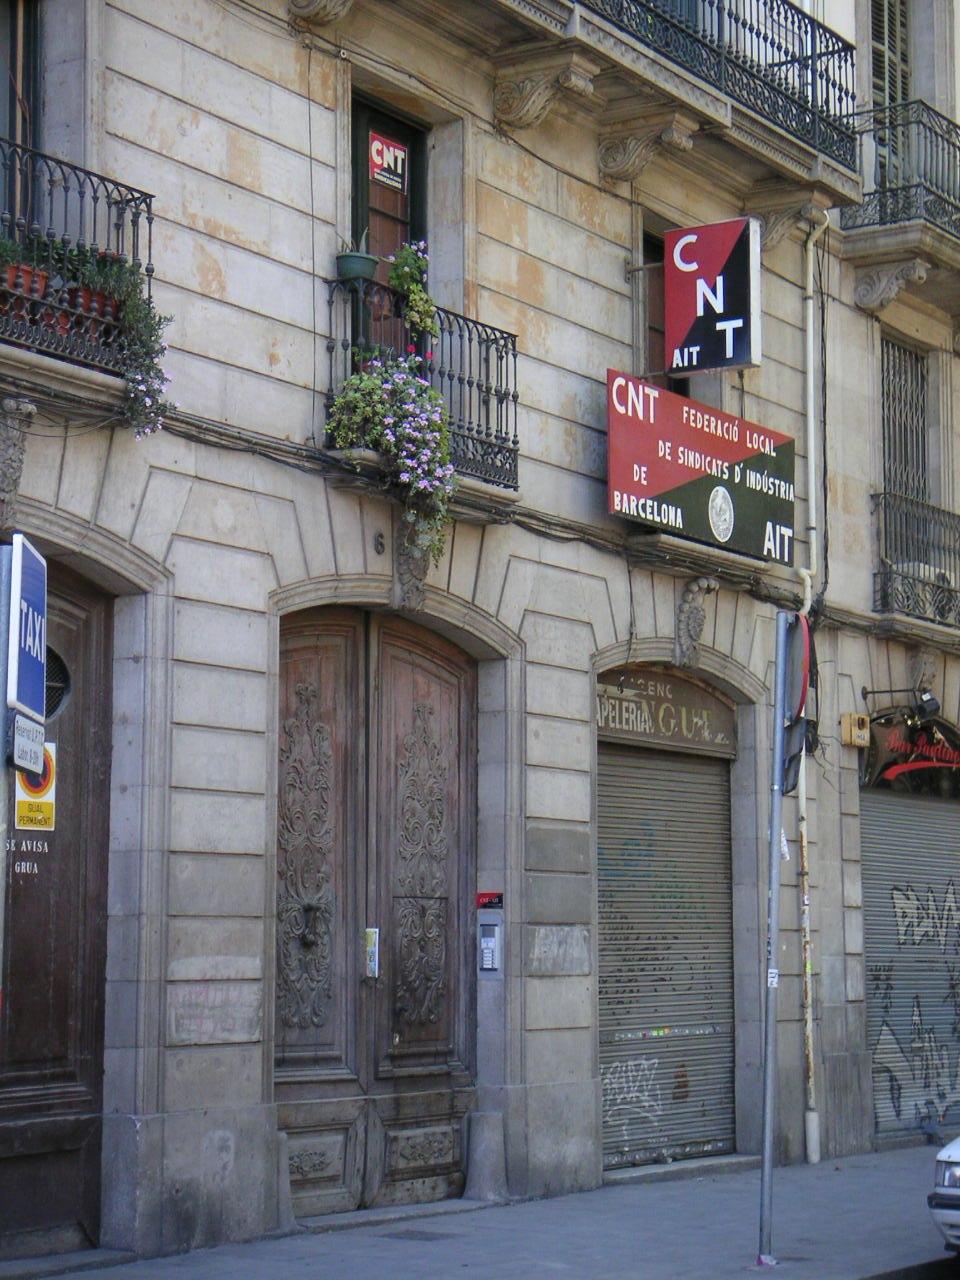 Barcelonacntait (110)